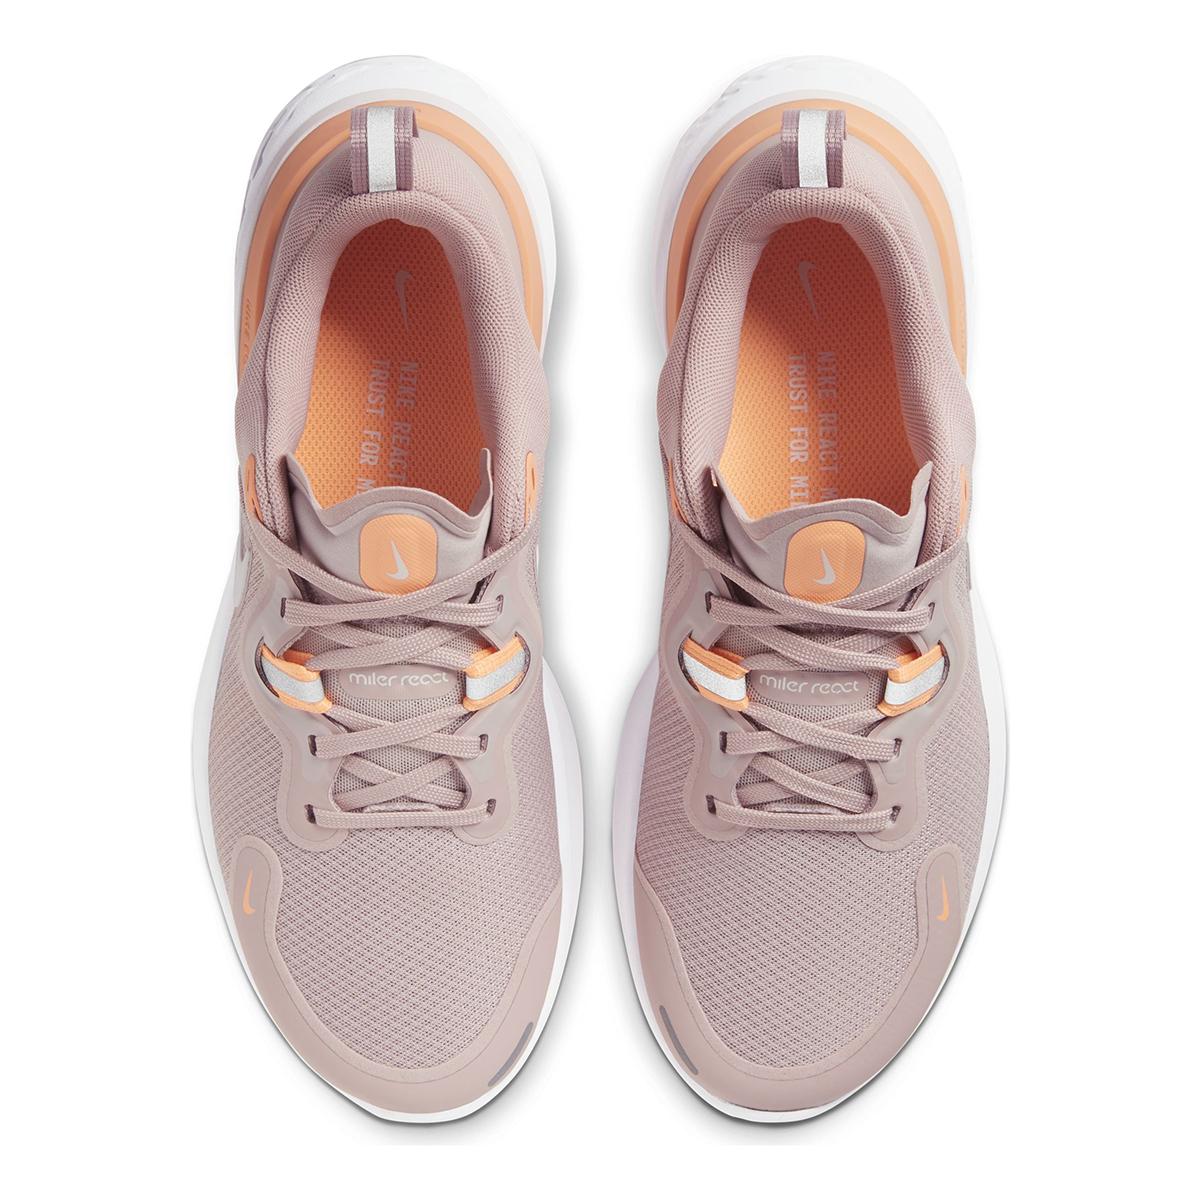 Women's Nike React Miler Running Shoe - Color: Champagne/Orange Pulse/Barely Rose/White (Regular Width) - Size: 5, Champagne/Orange Pulse/Barely Rose/White, large, image 5